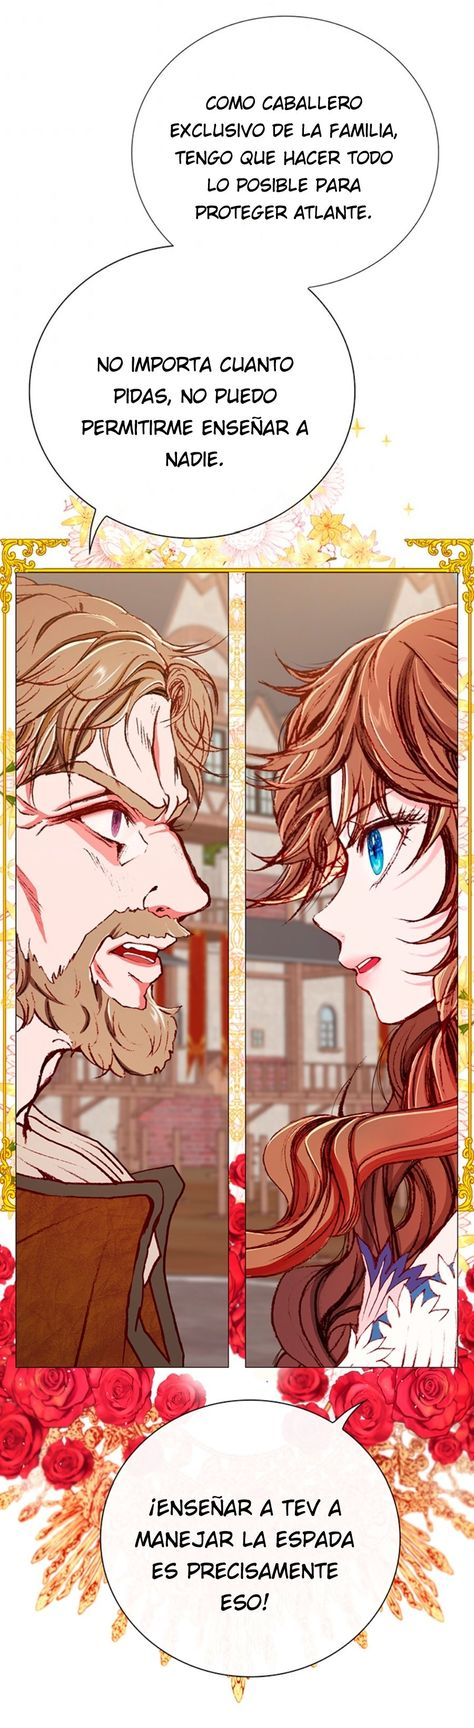 150 Ideas De Manga En 2021 Leer Manga Manga Español Manga Romance